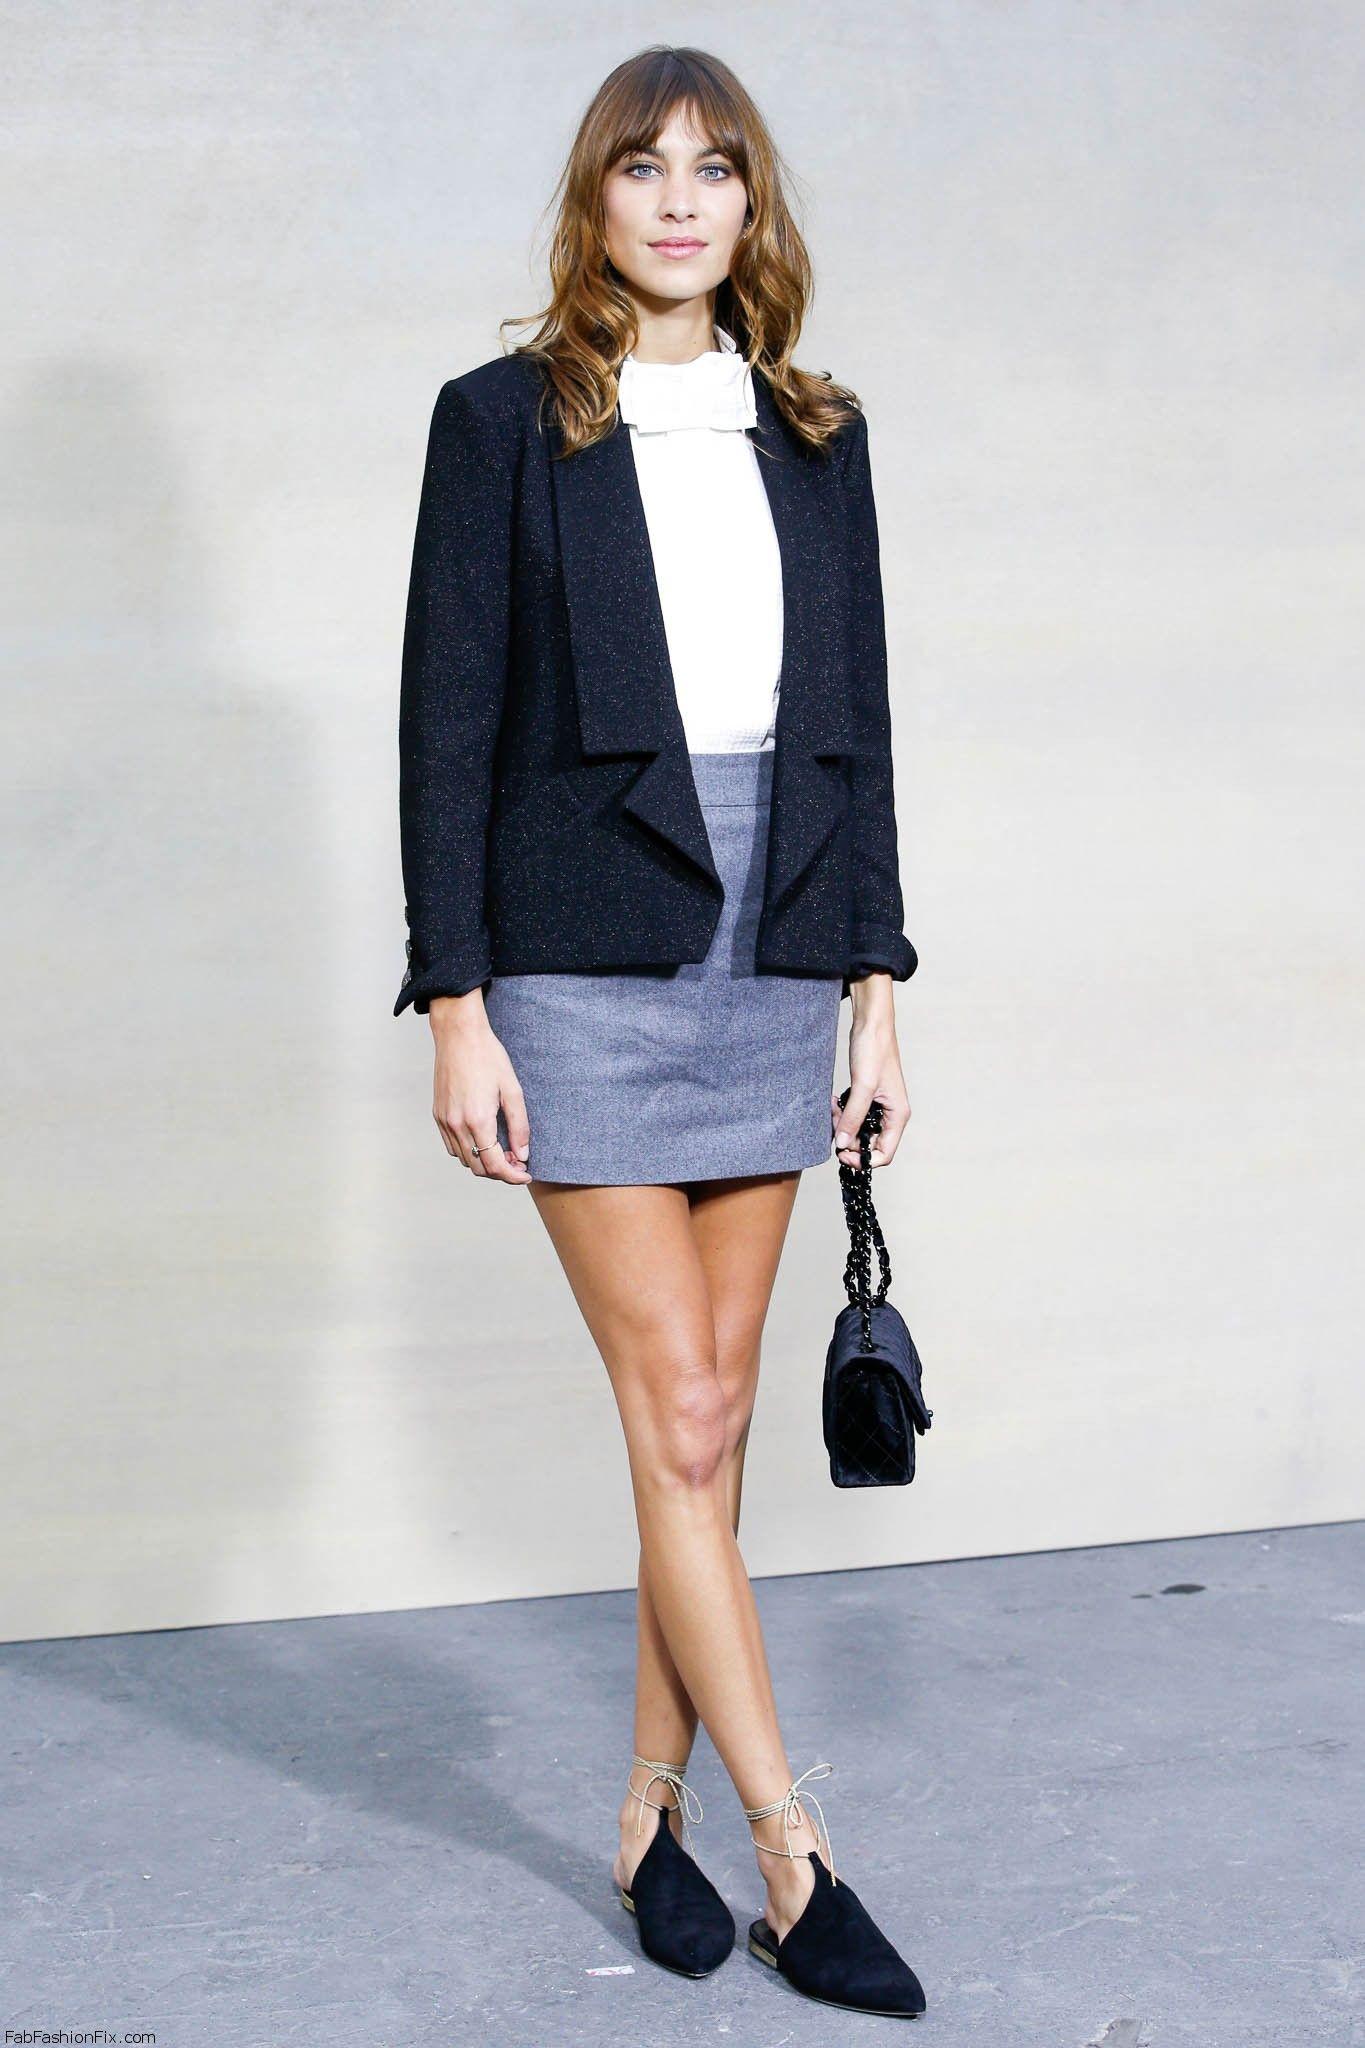 mid season skirt and blazer look 1